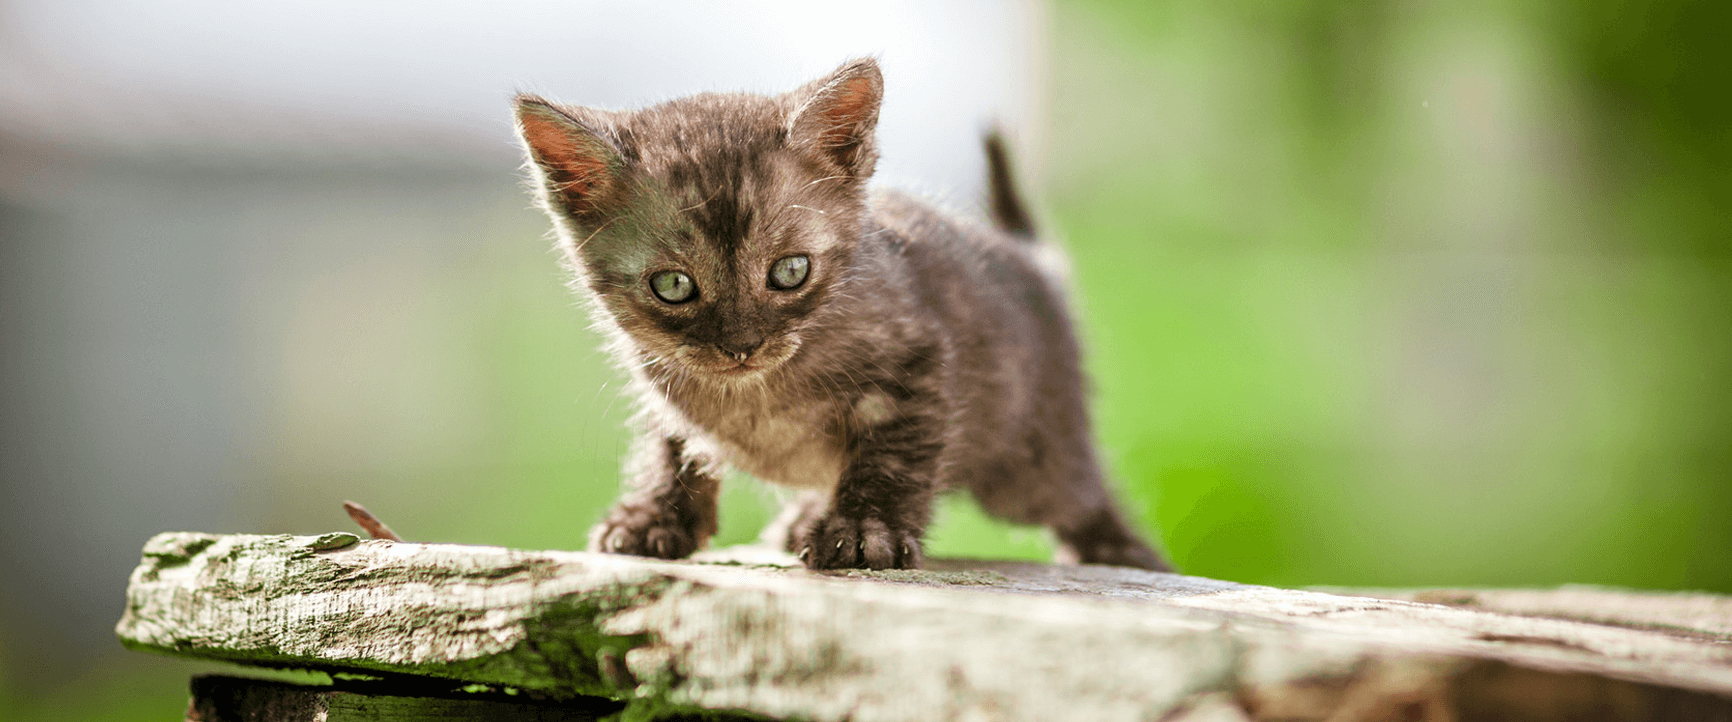 http://brookhurstanimal.com/wp-content/uploads/2016/09/cat-veterinarian-anaheim.png